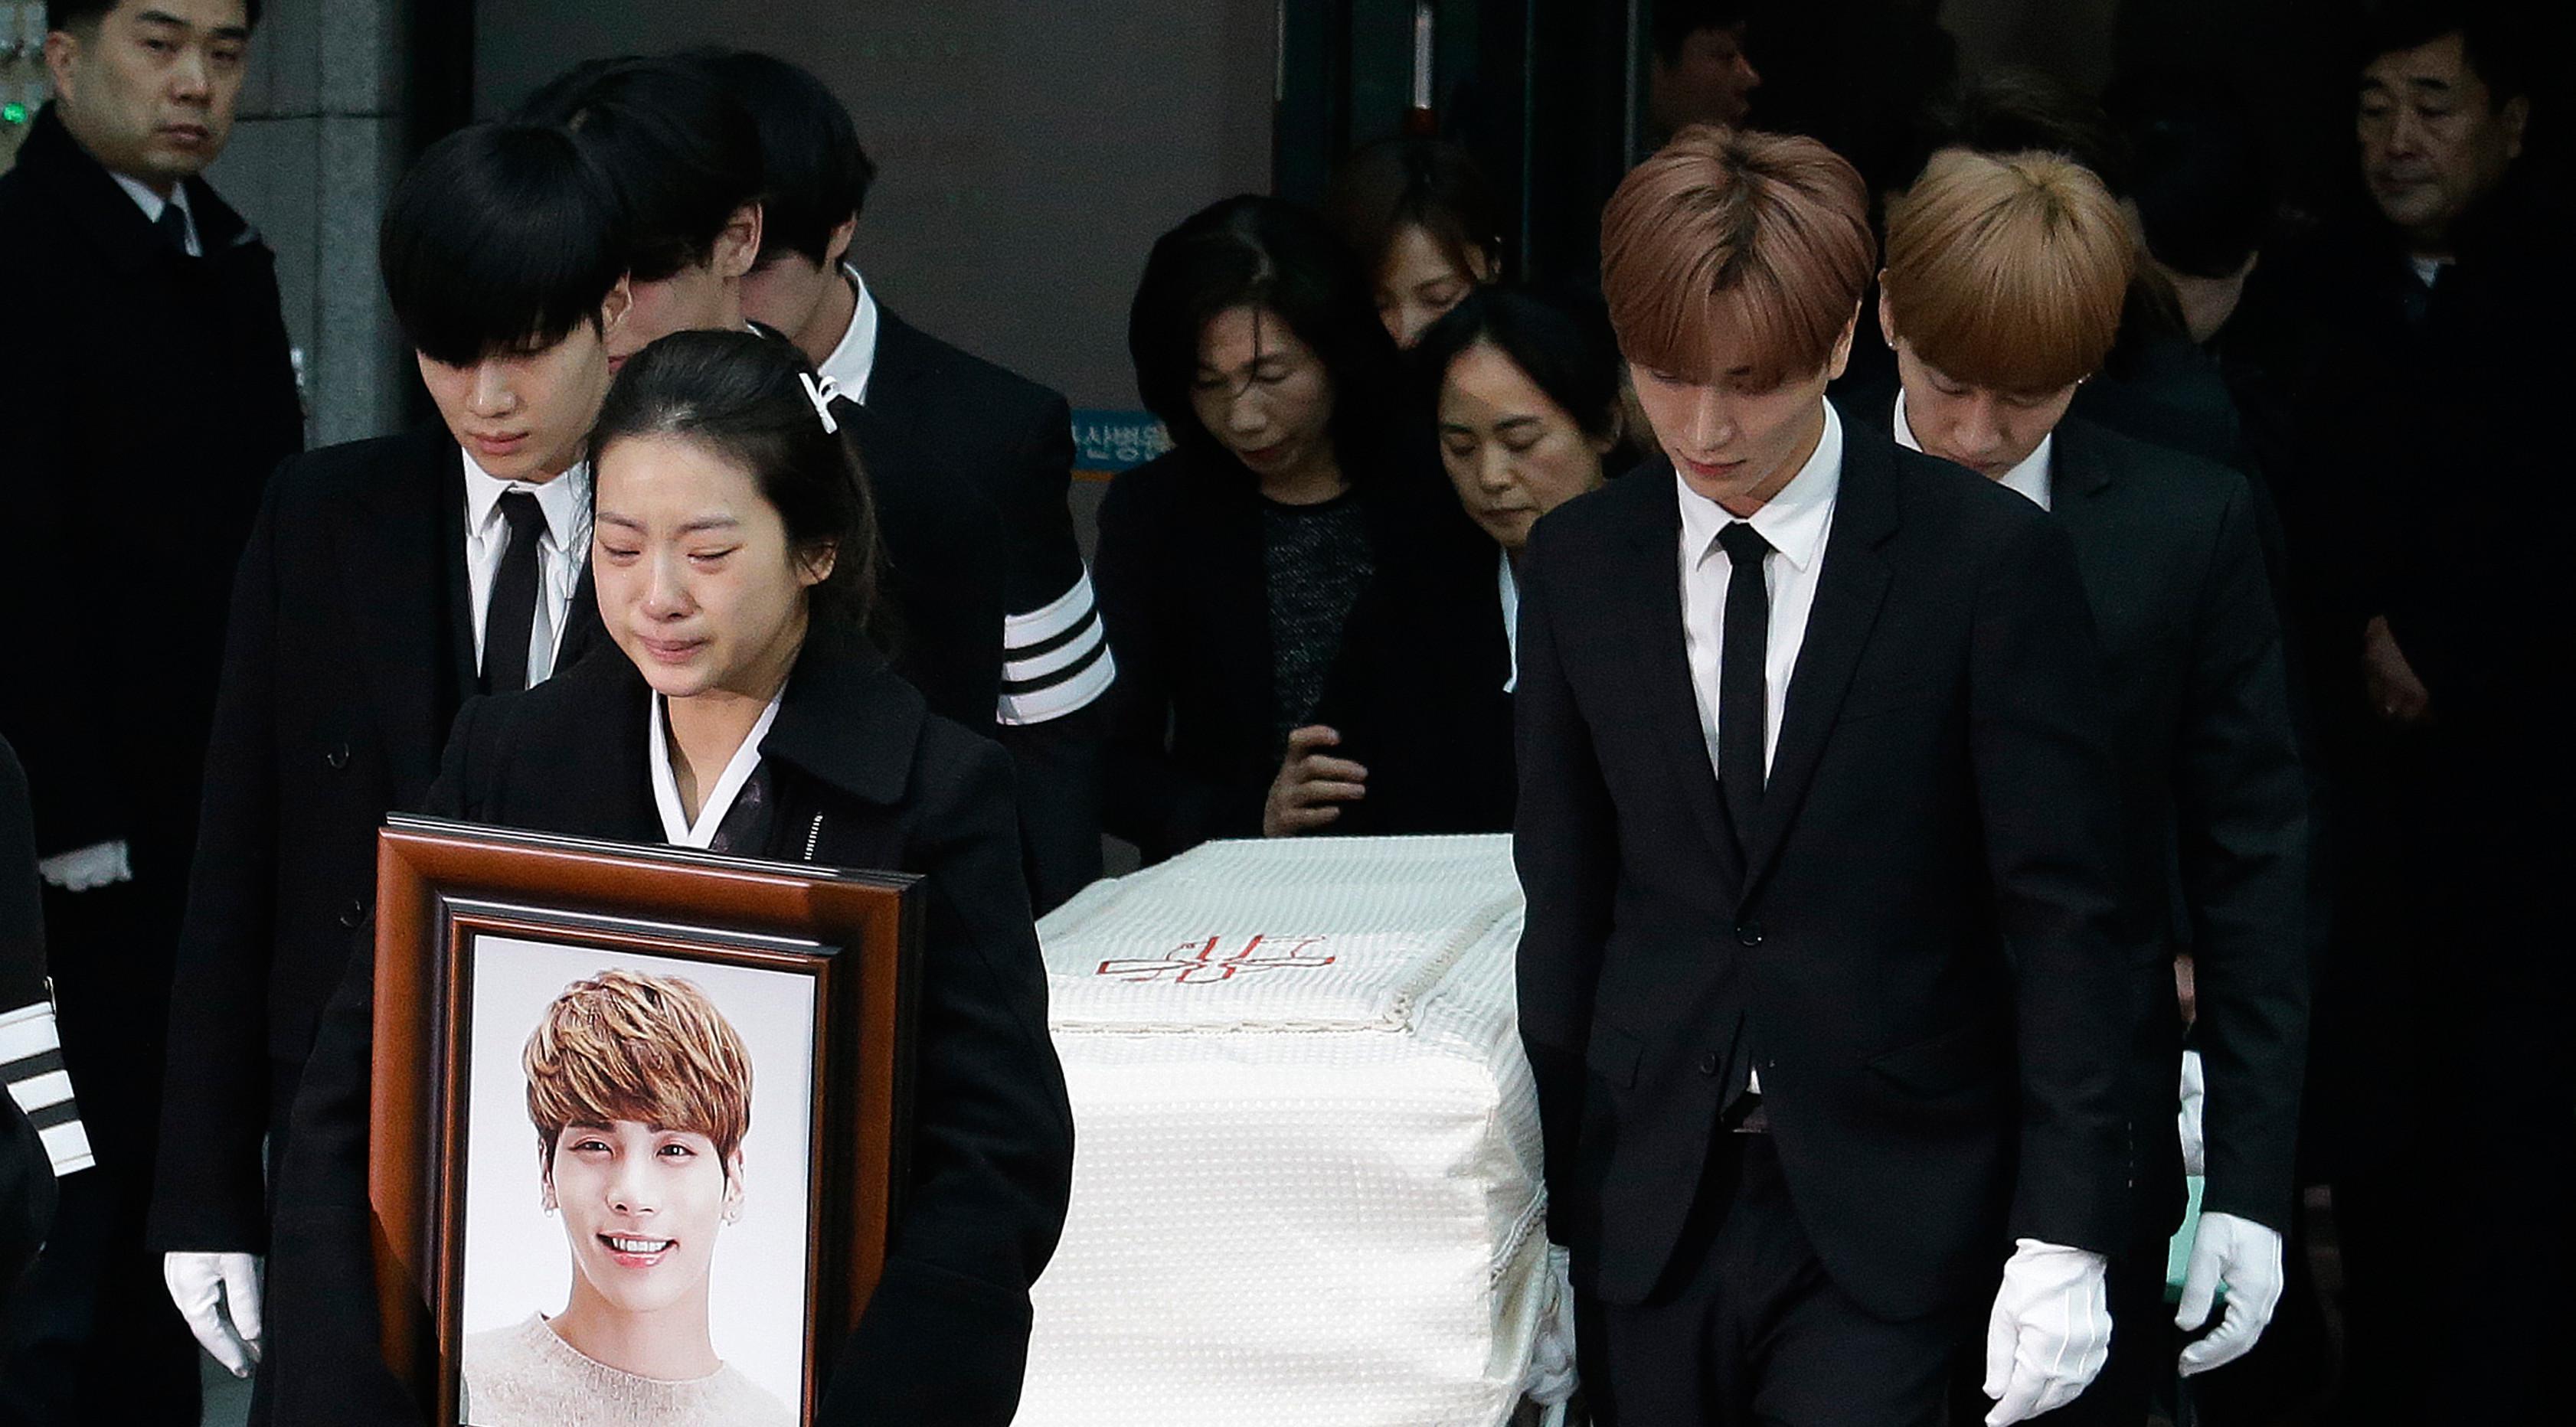 Kakak Jonghyun SHINee tak bisa menyembunyikan duka saat pelepasan jenazah sang adik menuju tempat pemakaman dari Asan Hospital, Seoul, Kamis (21/12). Keluarga dan teman-teman dekat mengantar Jonghyun ke tempat peristirahatan terakhir. (AP/Ahn Young-joon)